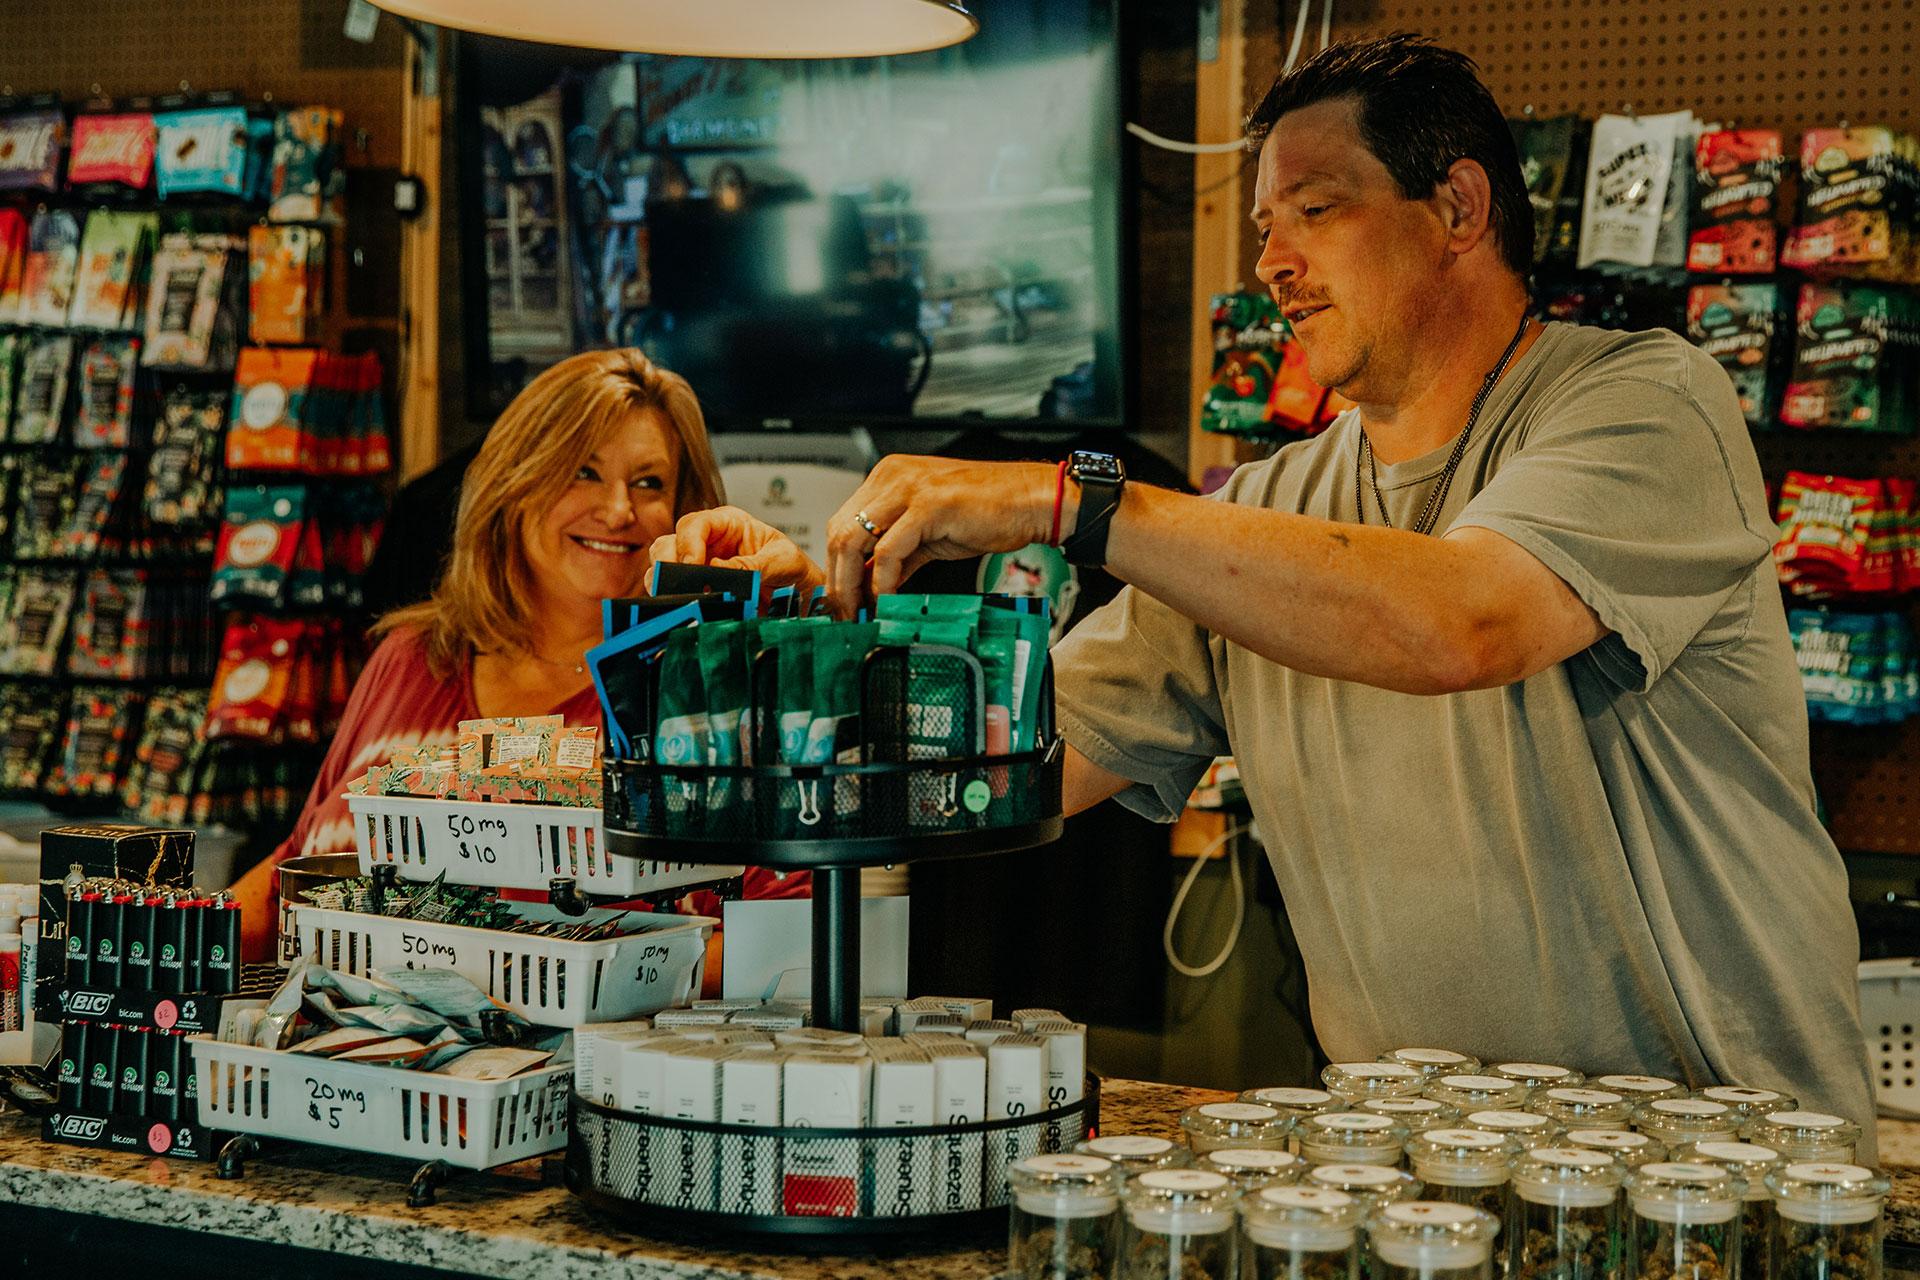 Denise and Christopher Mink doing inventory at Med Pharm OK Dispensary.